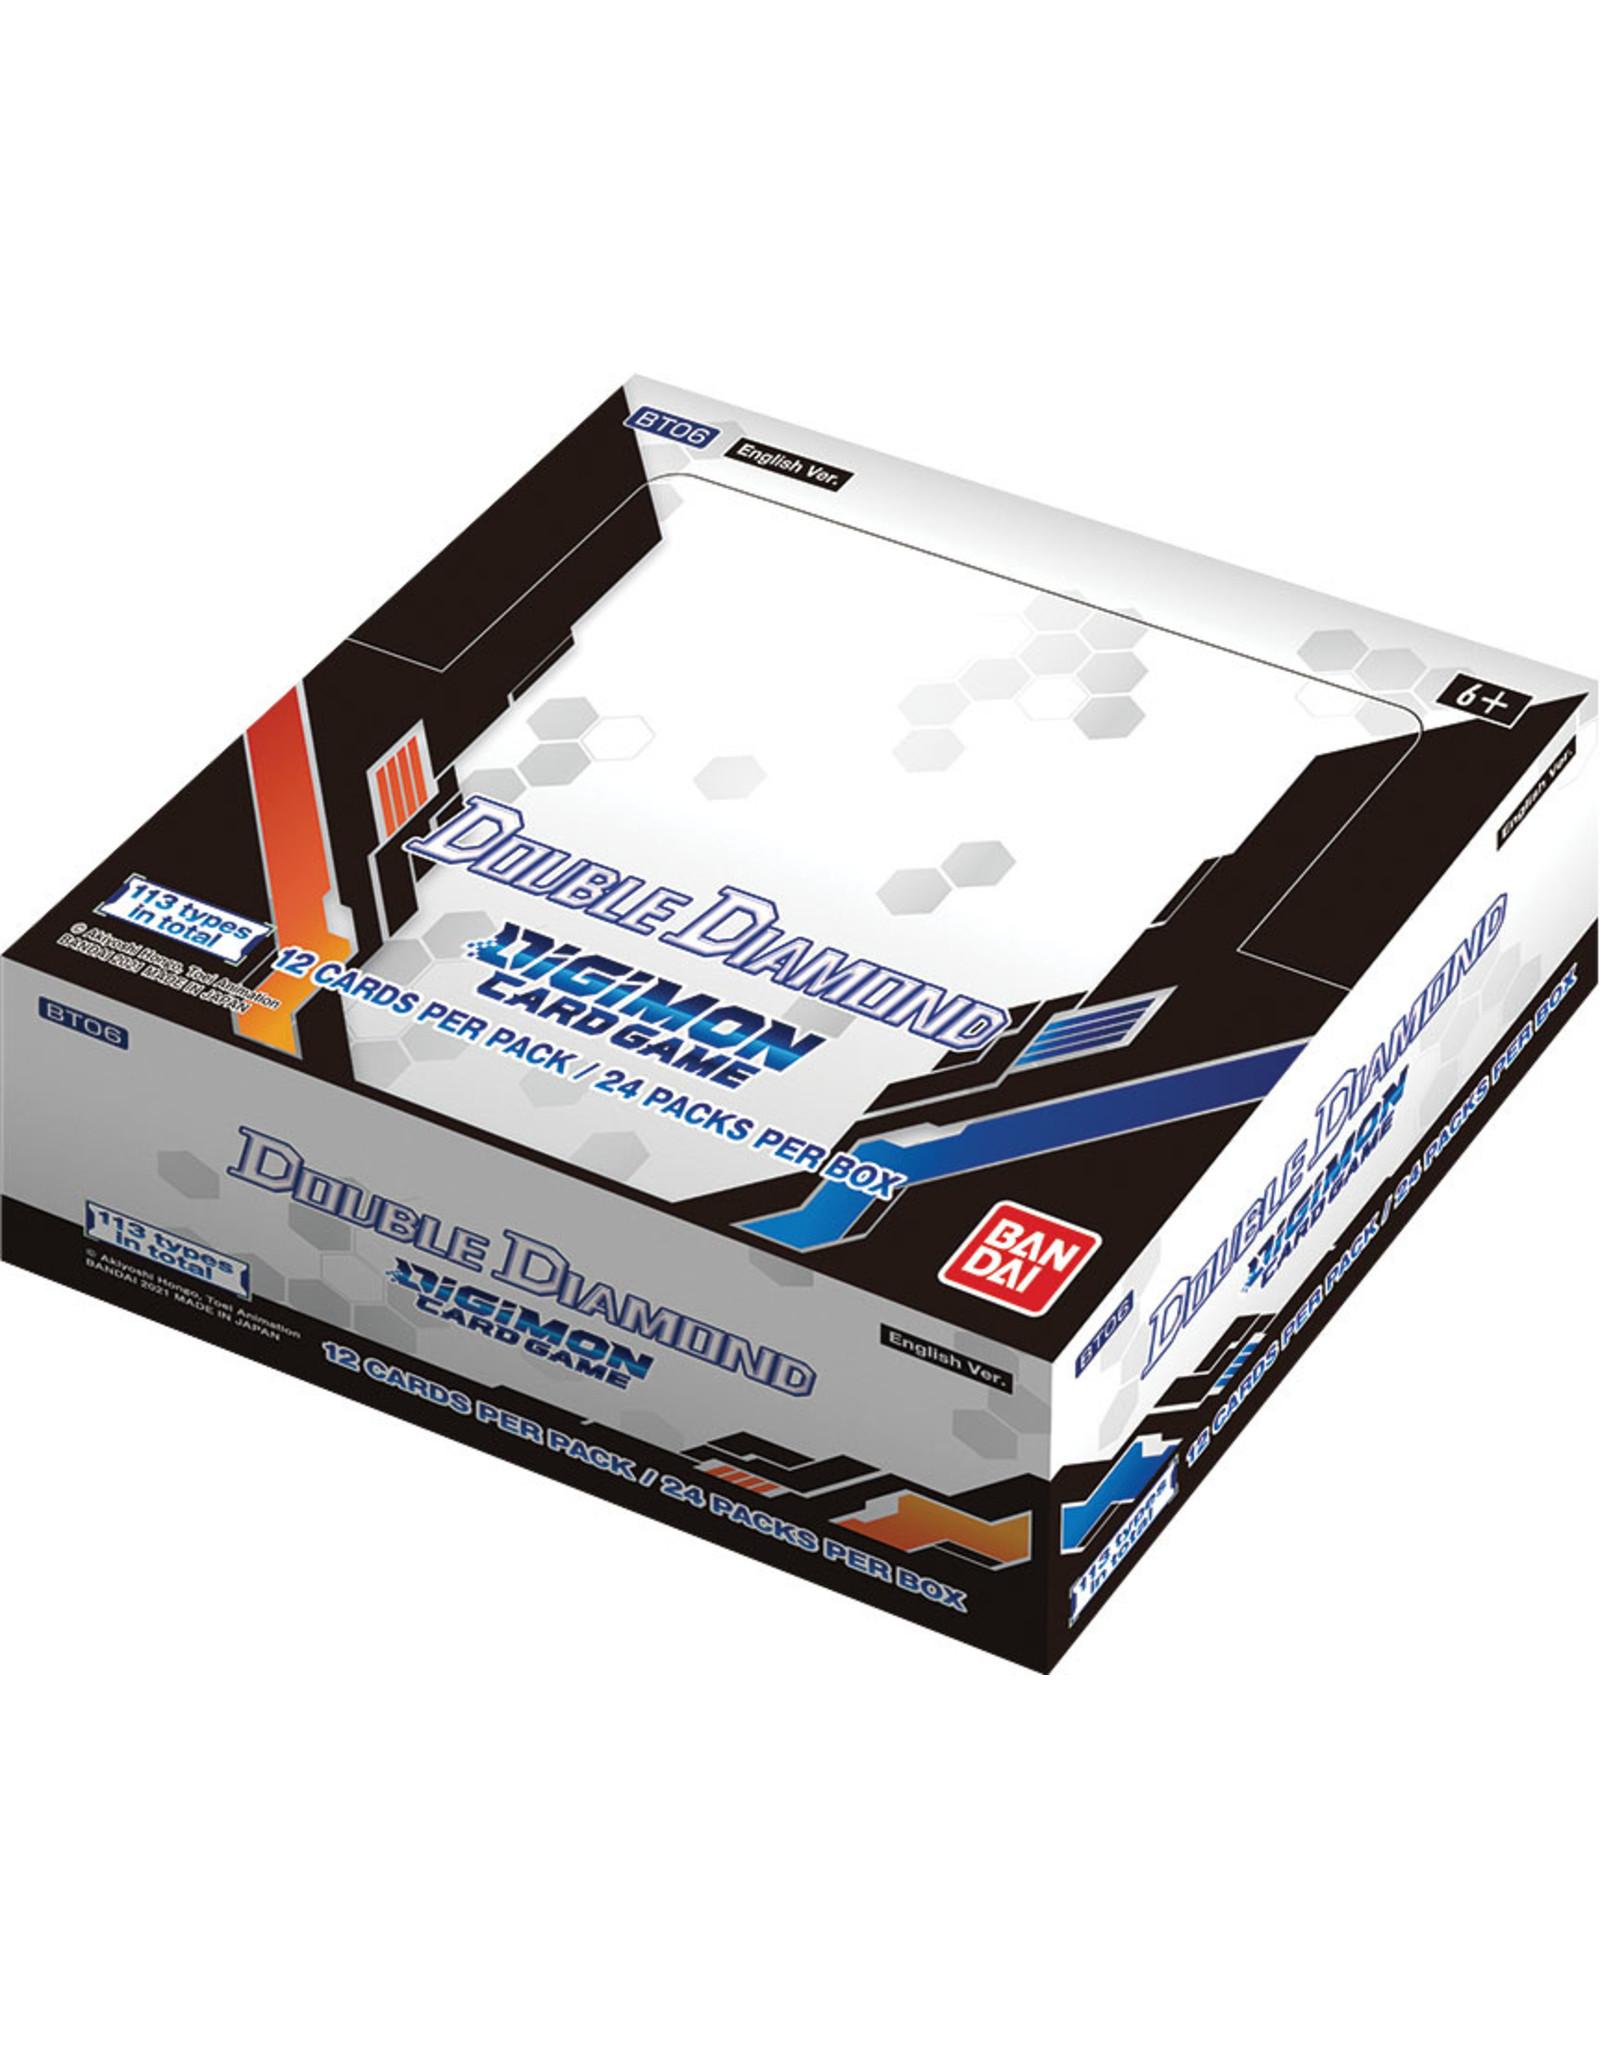 DIGIMON TCG DOUBLE DIAMOND BOOSTER BOX PRE-ORDER